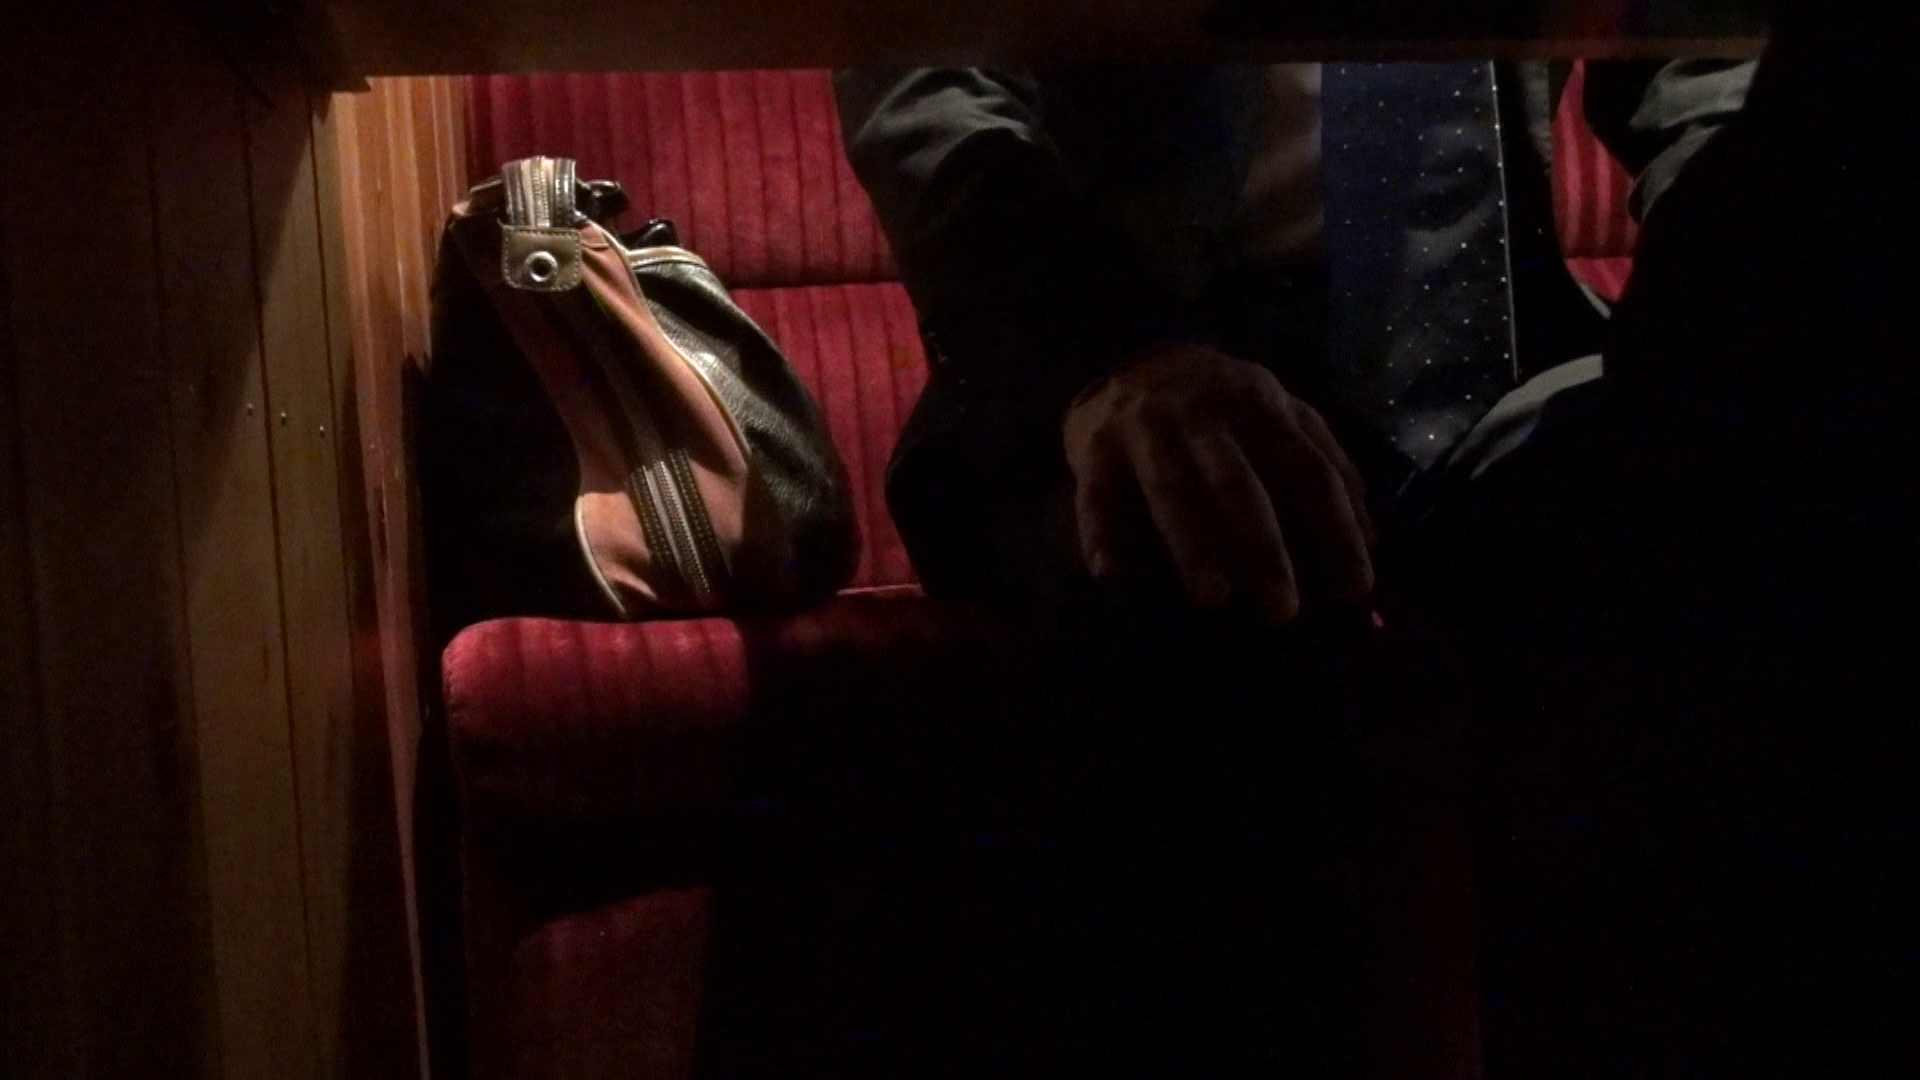 episode1 ヒロトさんと保険外交員との顔合わせ 盗撮エロすぎ   熟女  51連発 12